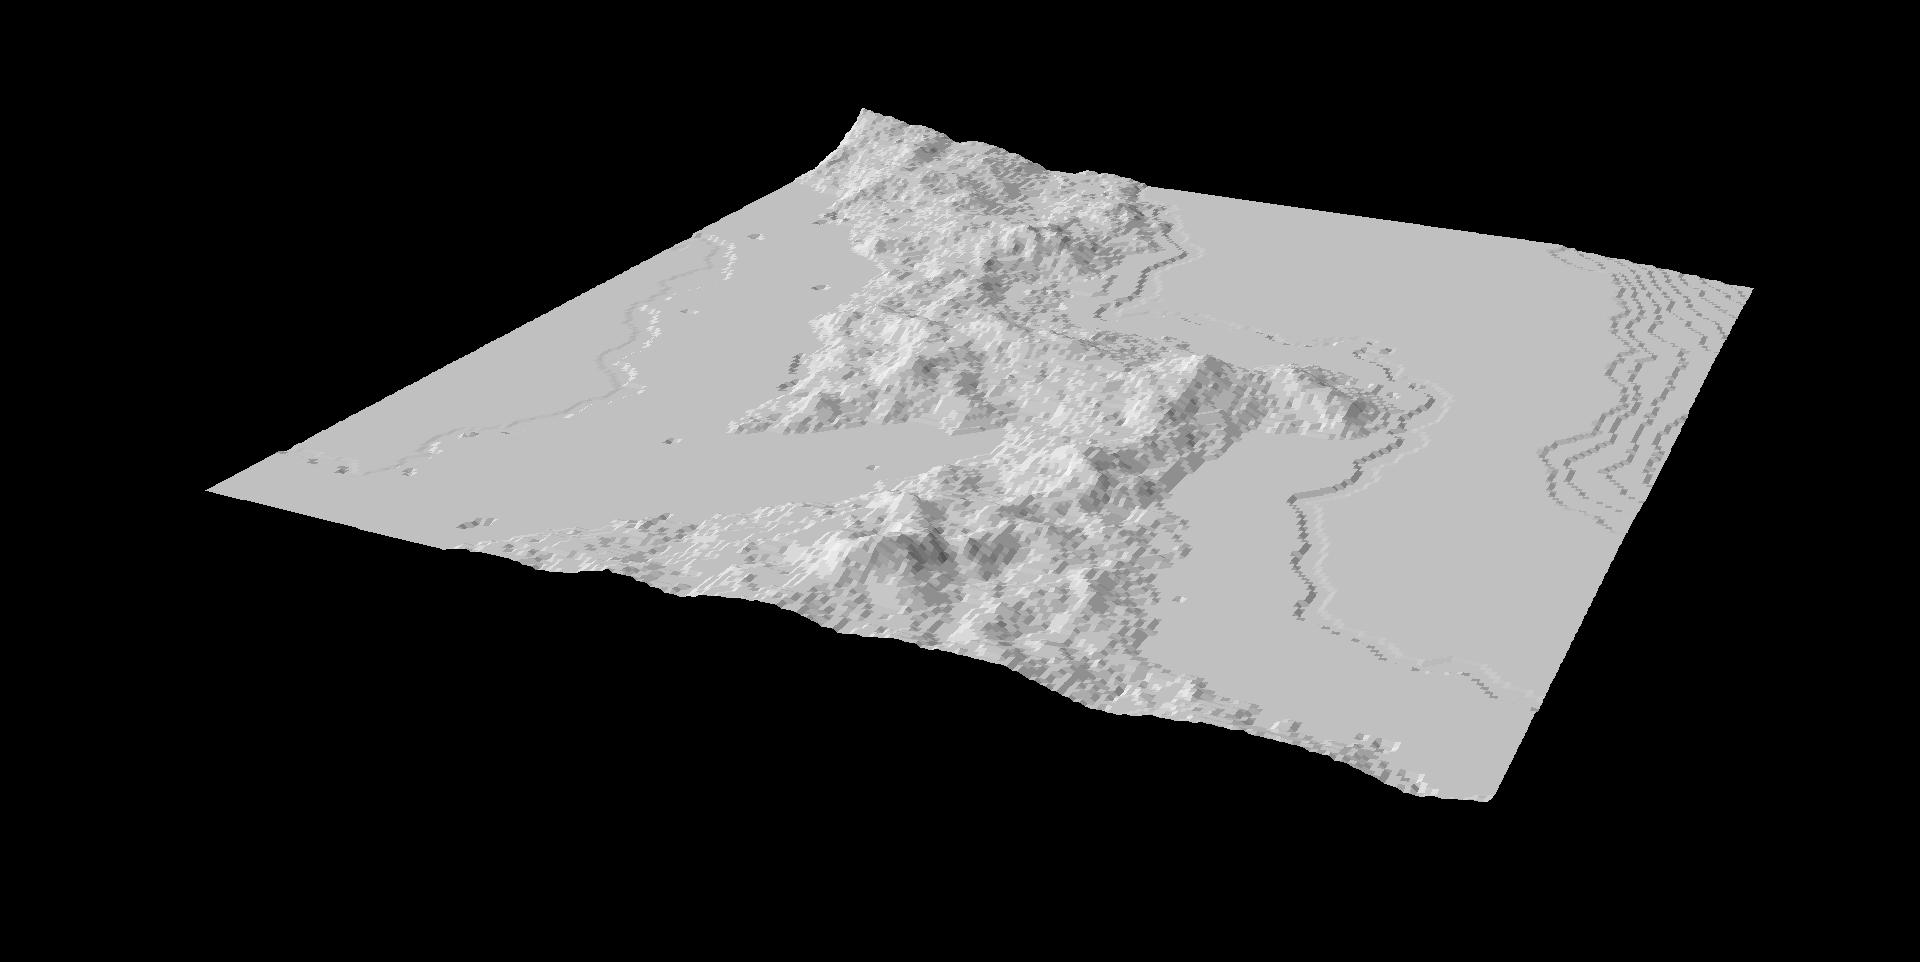 https://neorail.jp/forum/uploads/map_hishimeki_init_heightmap_R_0.5_0621-1700.png